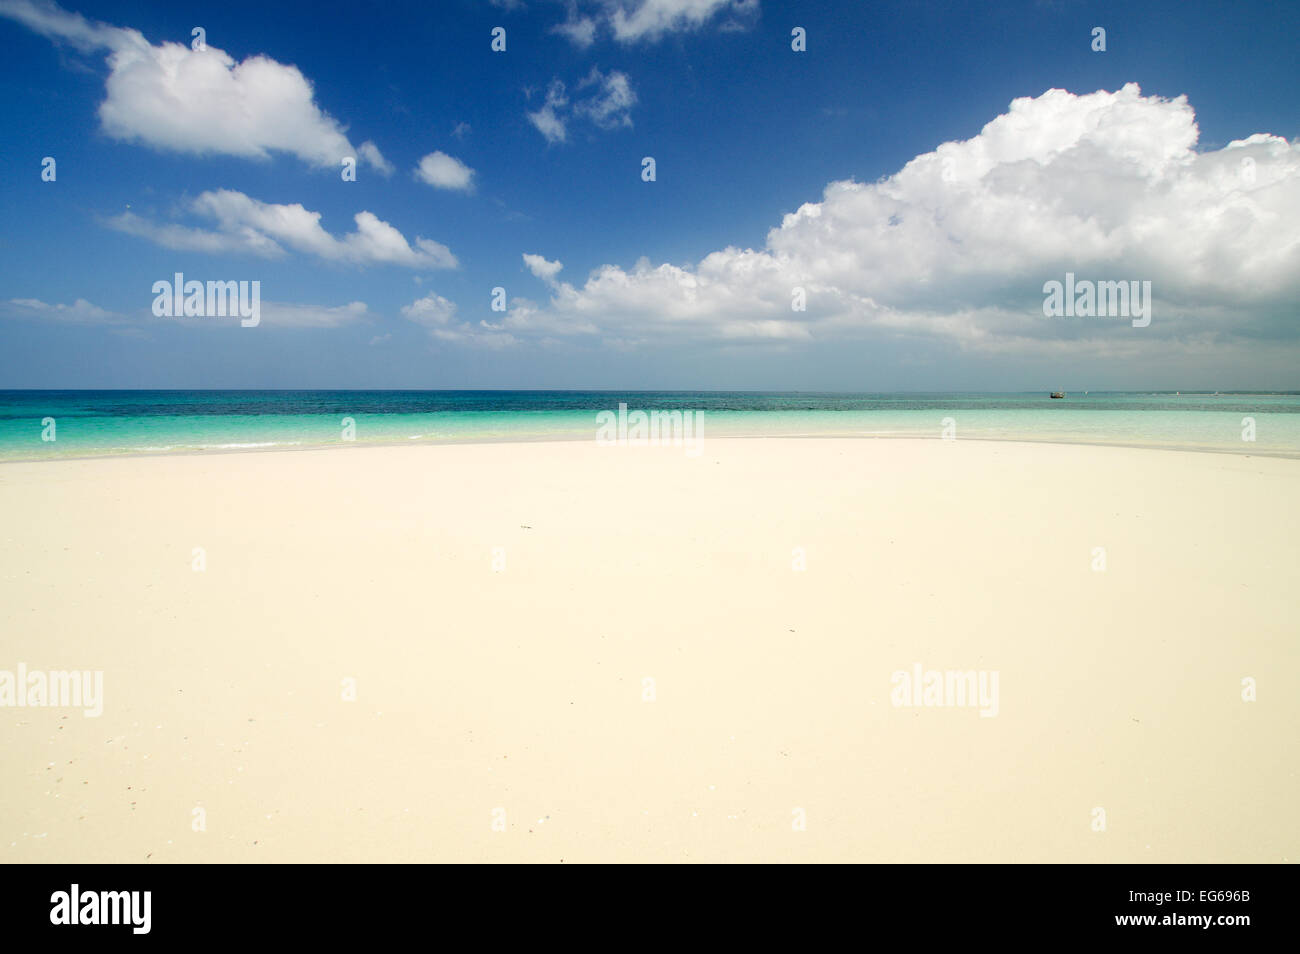 Breathtaking vista of the Indian Ocean off the Zanzibari coast - Stock Image